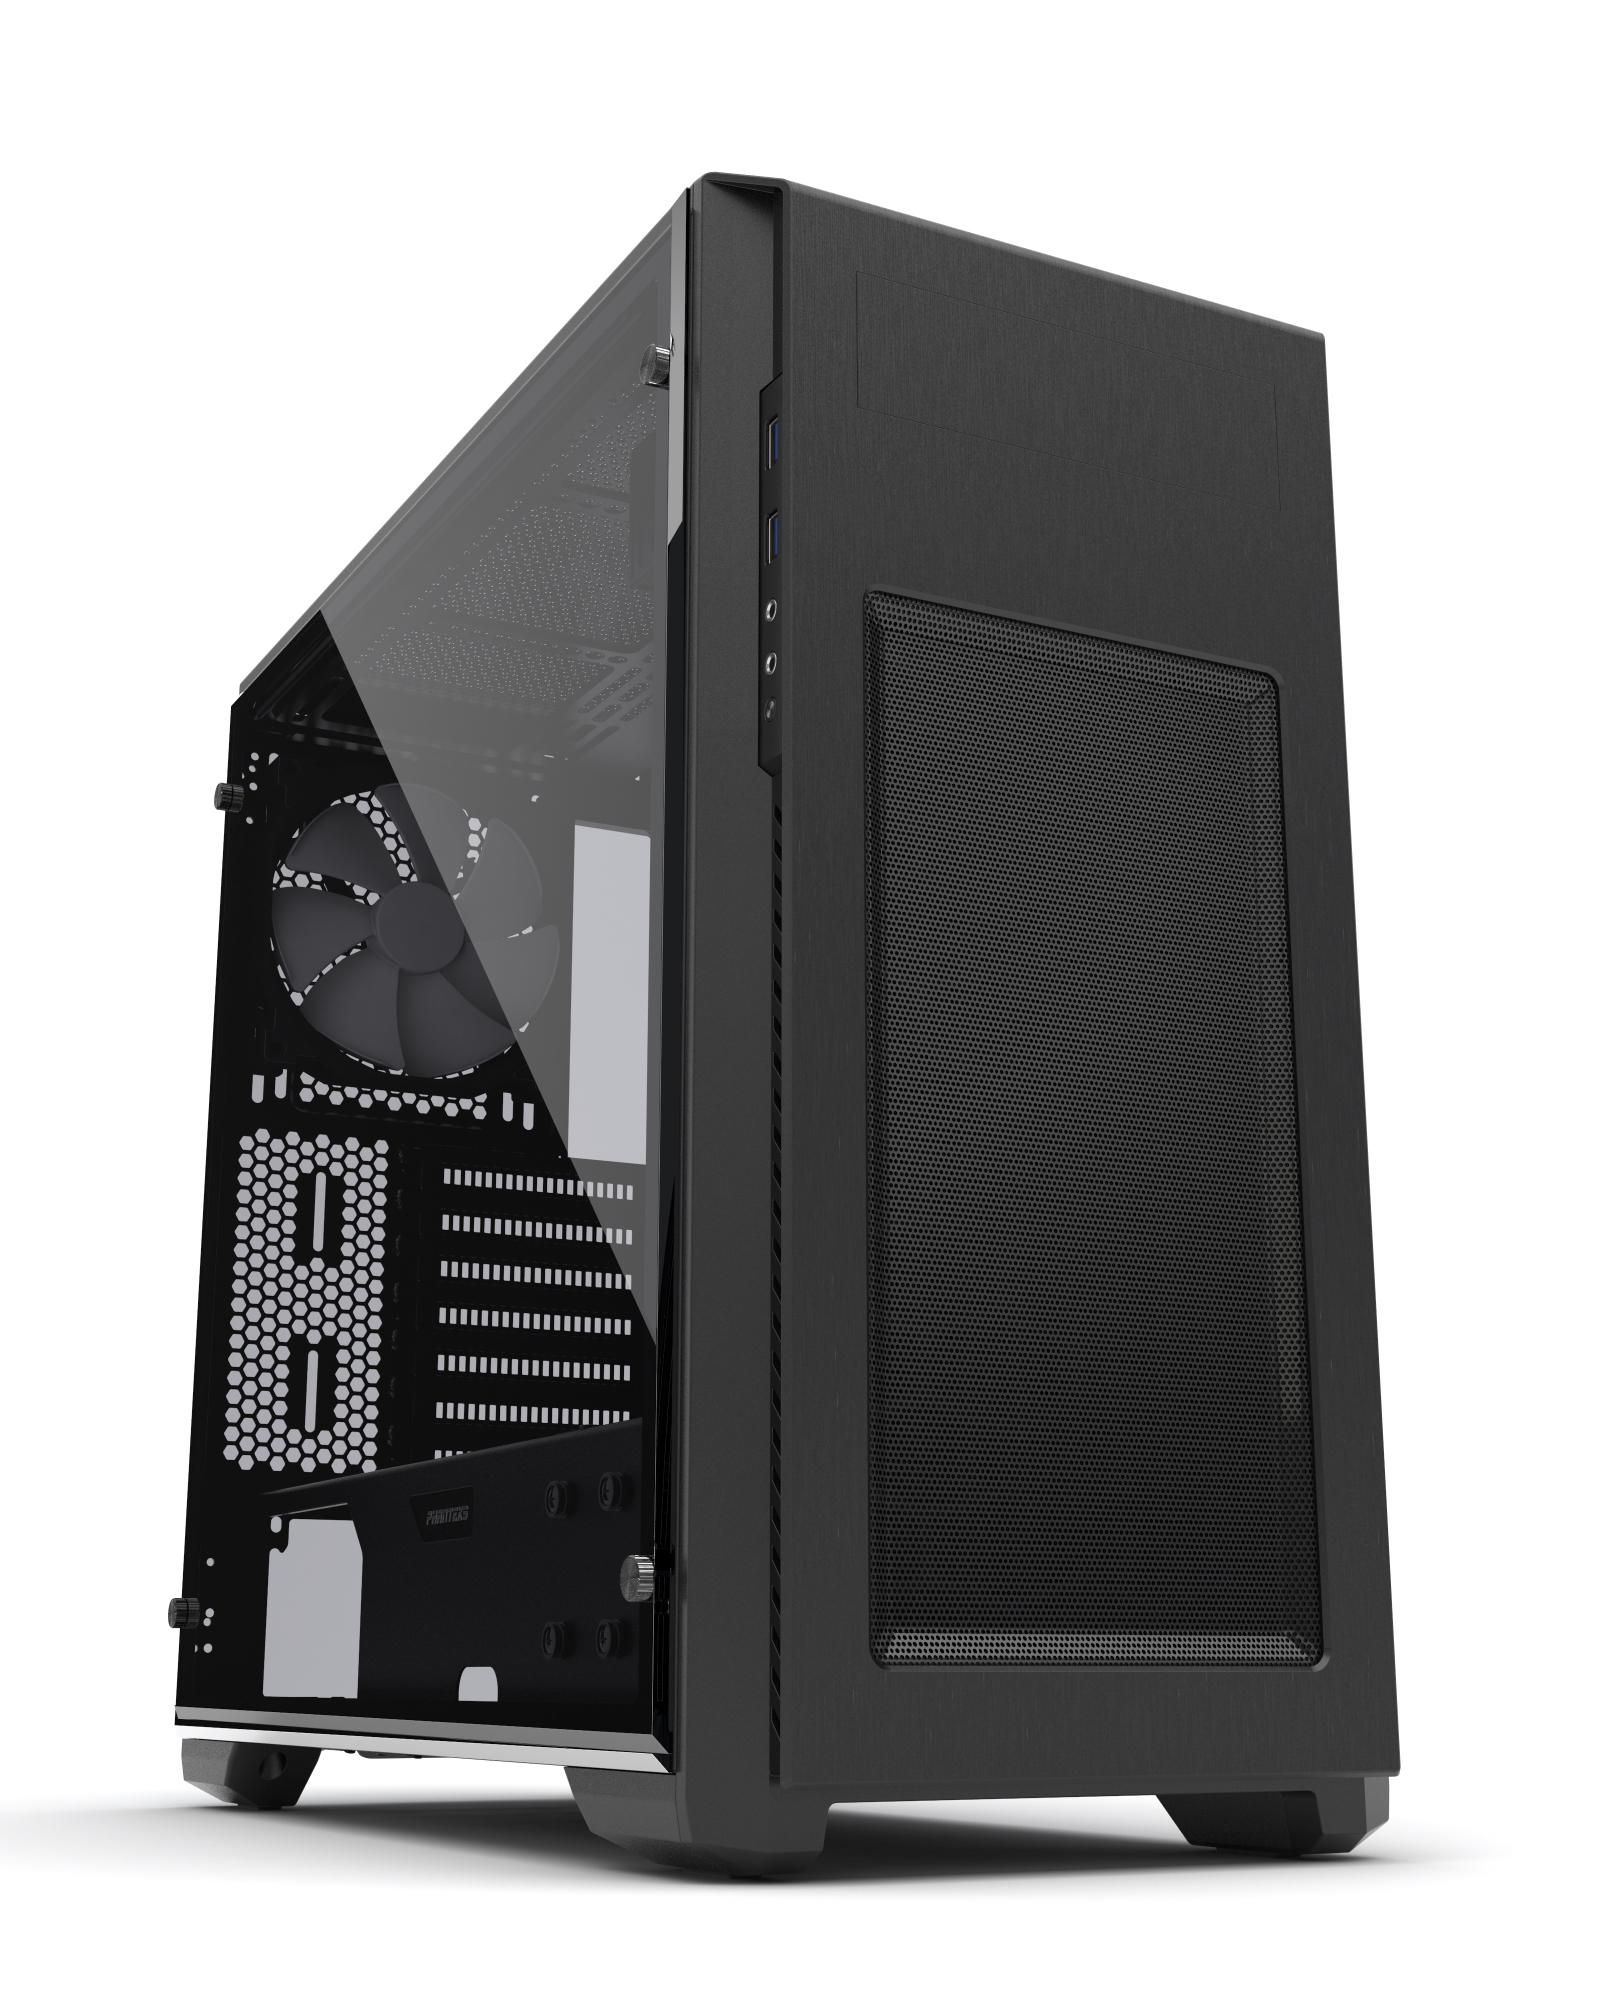 Phanteks Enthoo Pro M Midi-Tower Black